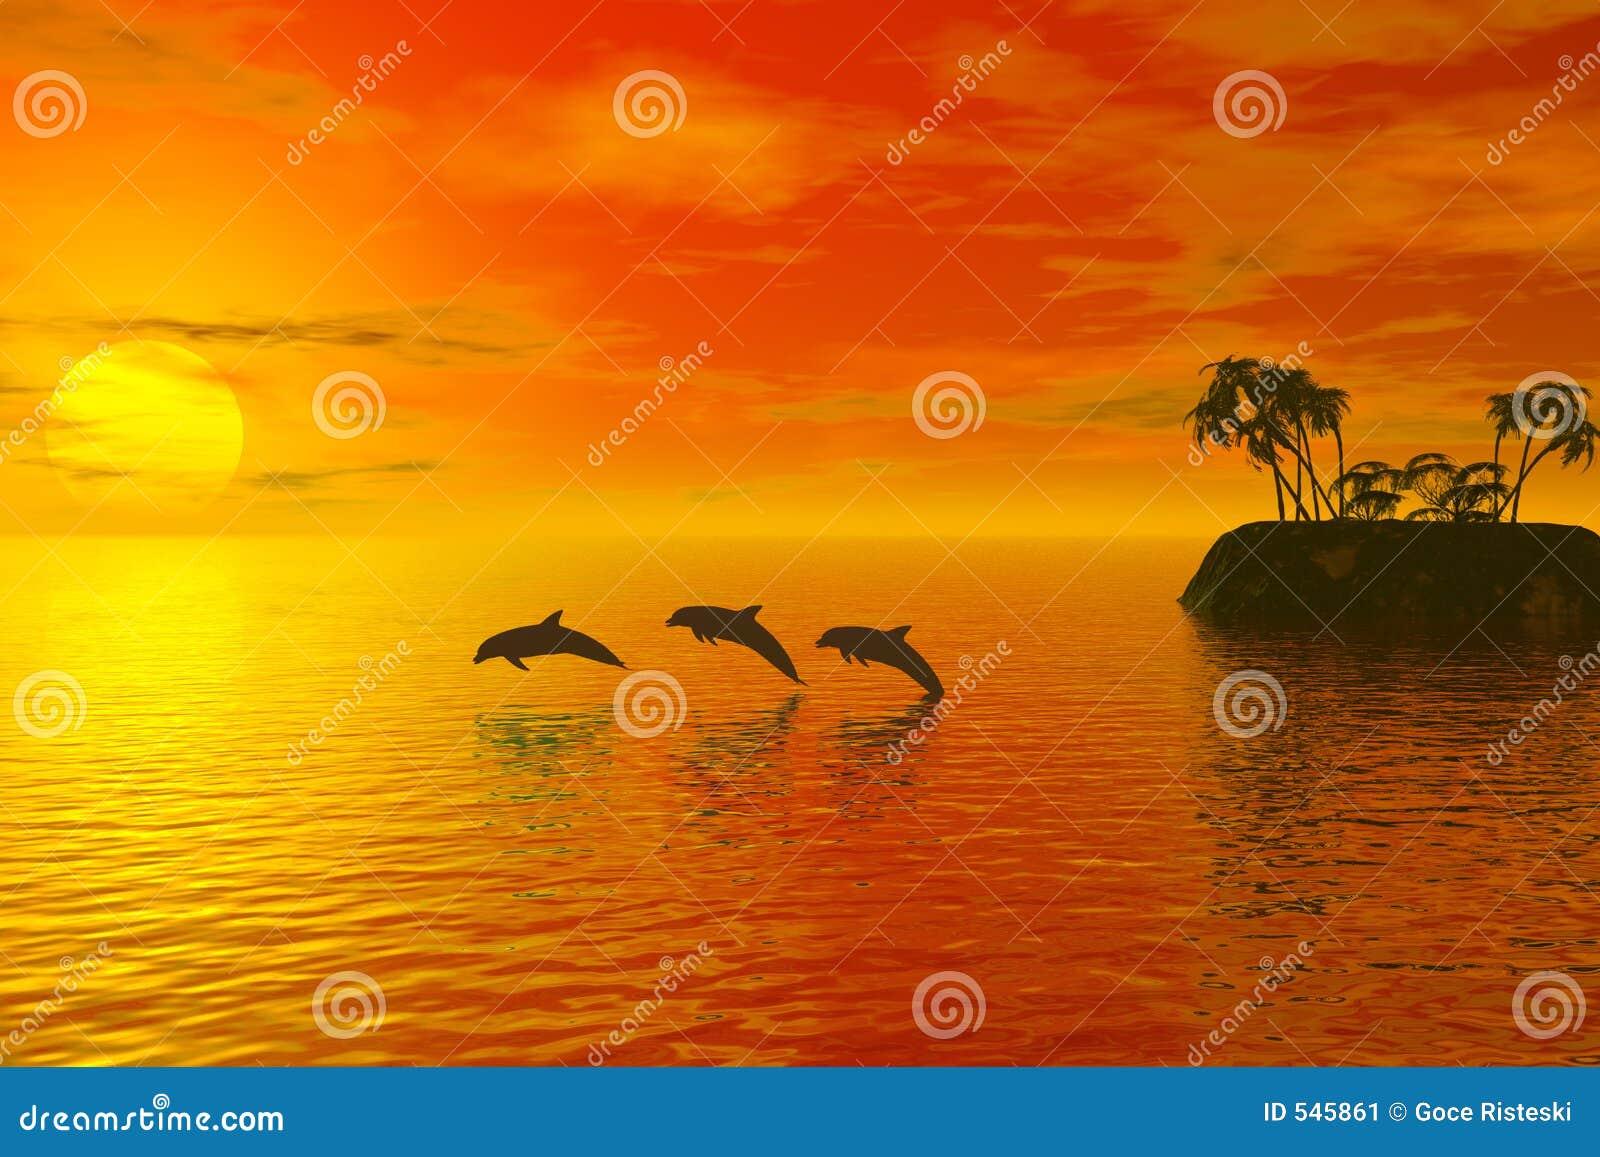 Download 海豚 库存例证. 插画 包括有 哺乳动物, 天空, 微明, 海岛, 黄昏, 海洋, 夏天, 和平, 海豚, 海运 - 545861